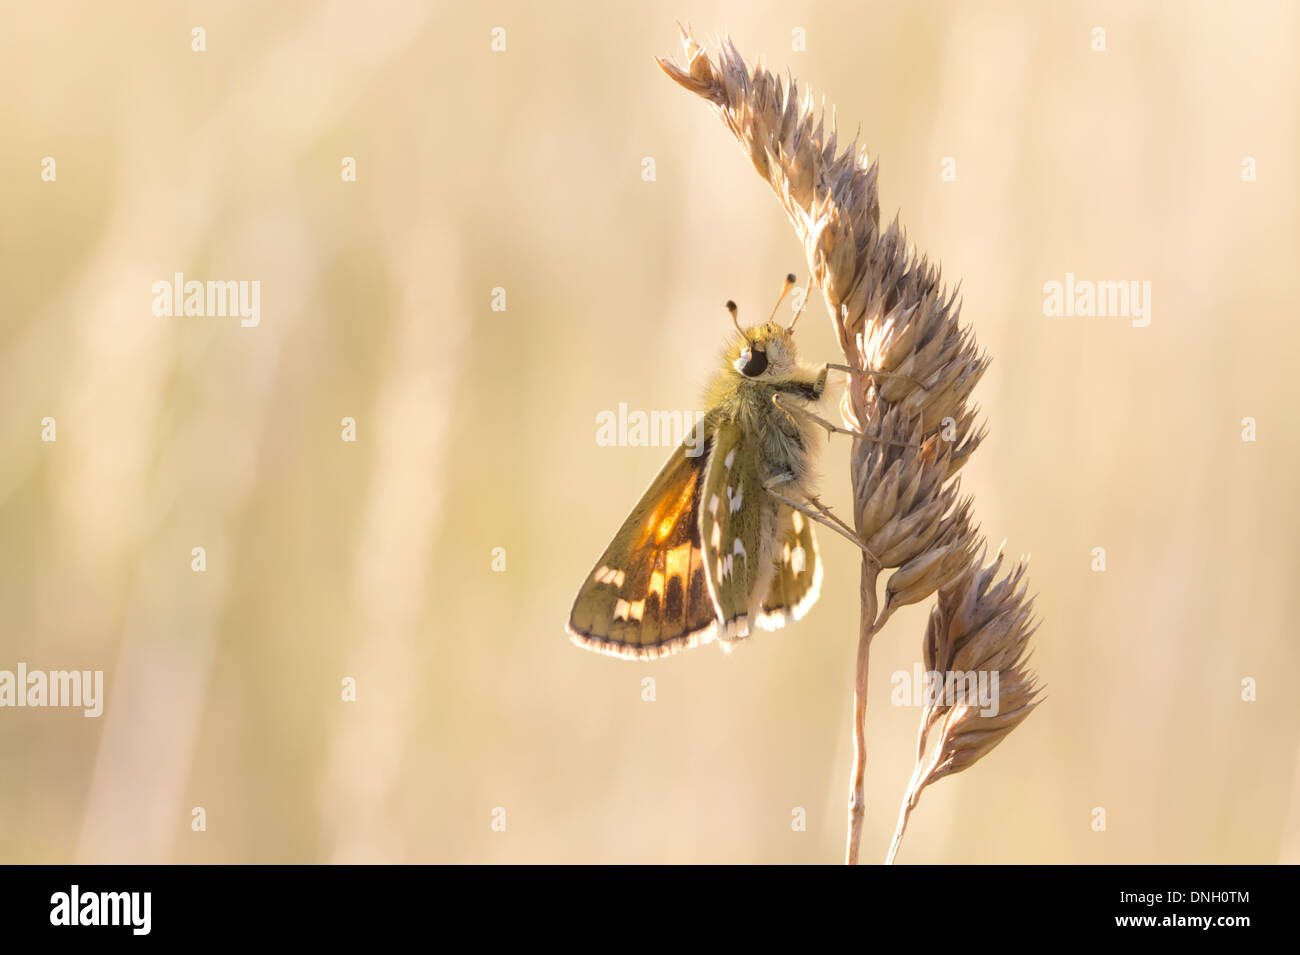 Silver-spotted skipper (hesperia comma) on grass head. Surrey, UK. Stock Photo